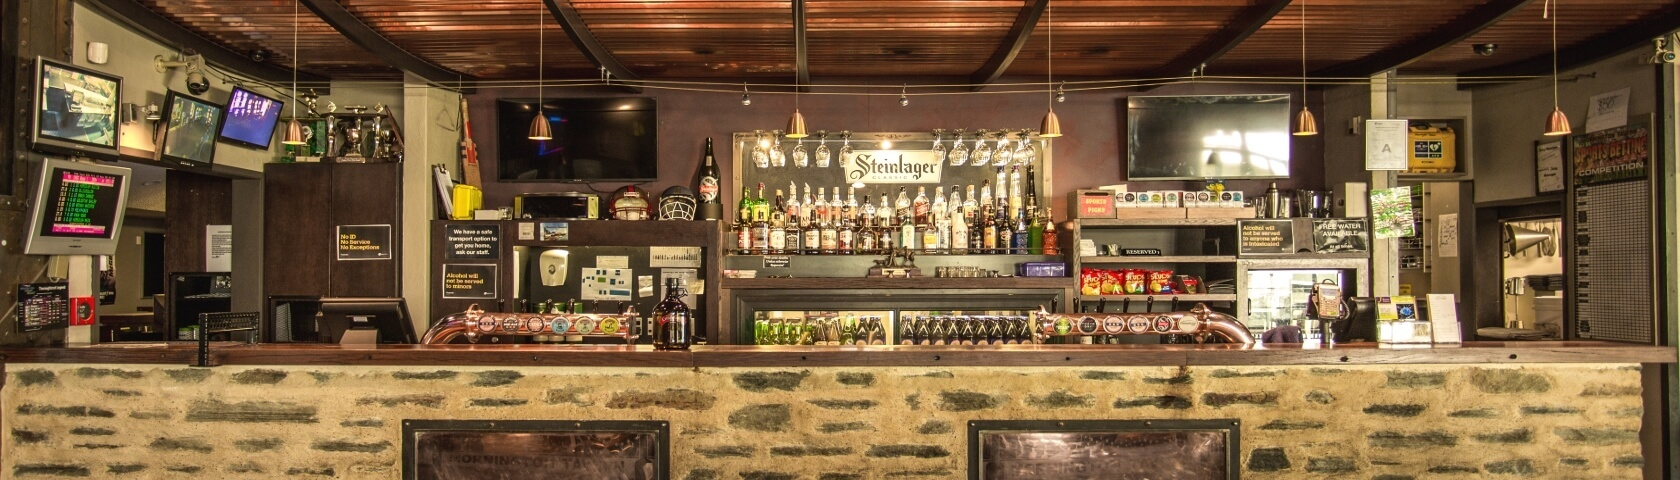 Mornington Tavern